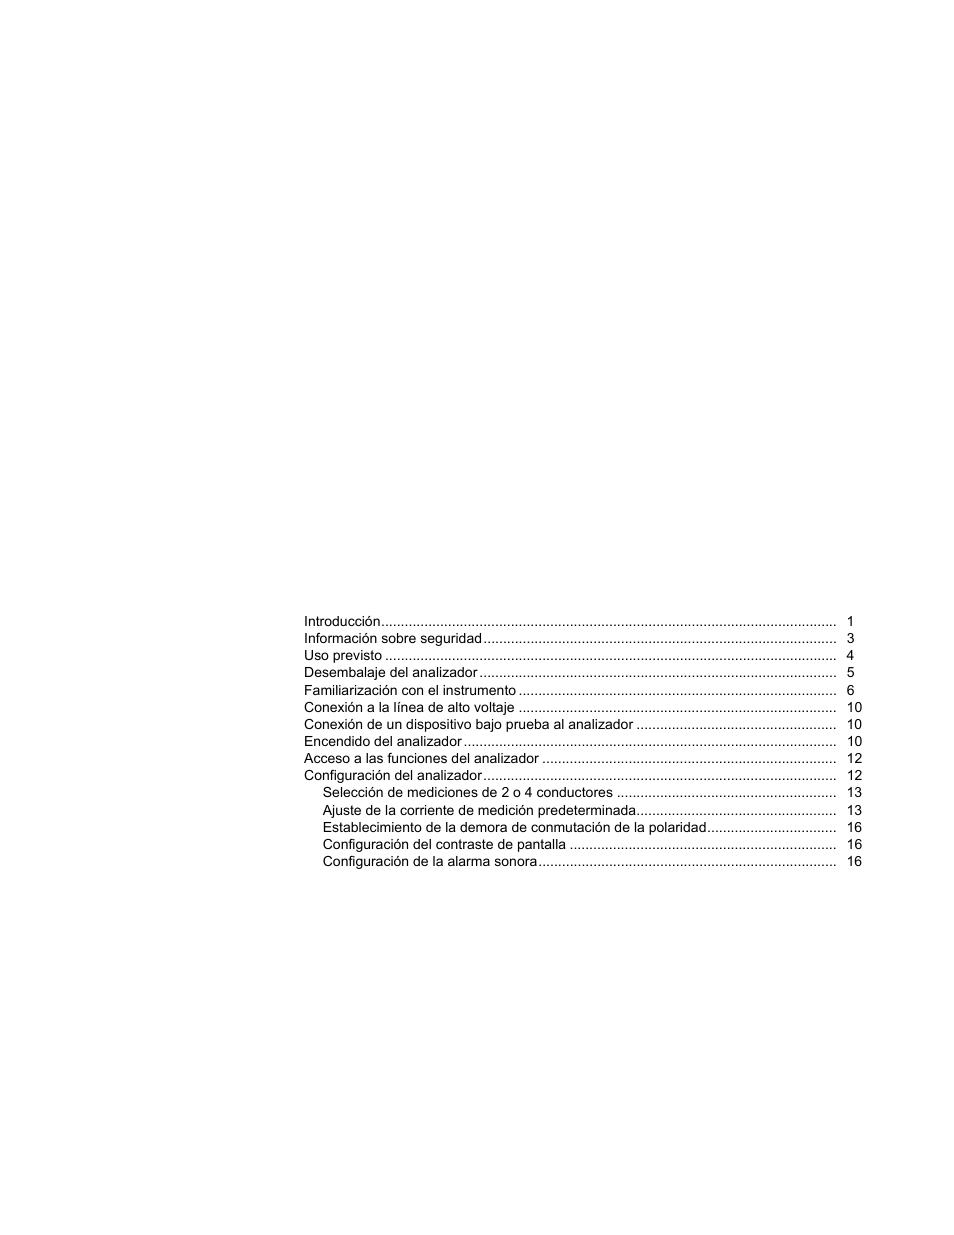 Tabla de materias | Fluke Biomedical ESA620 Manual del